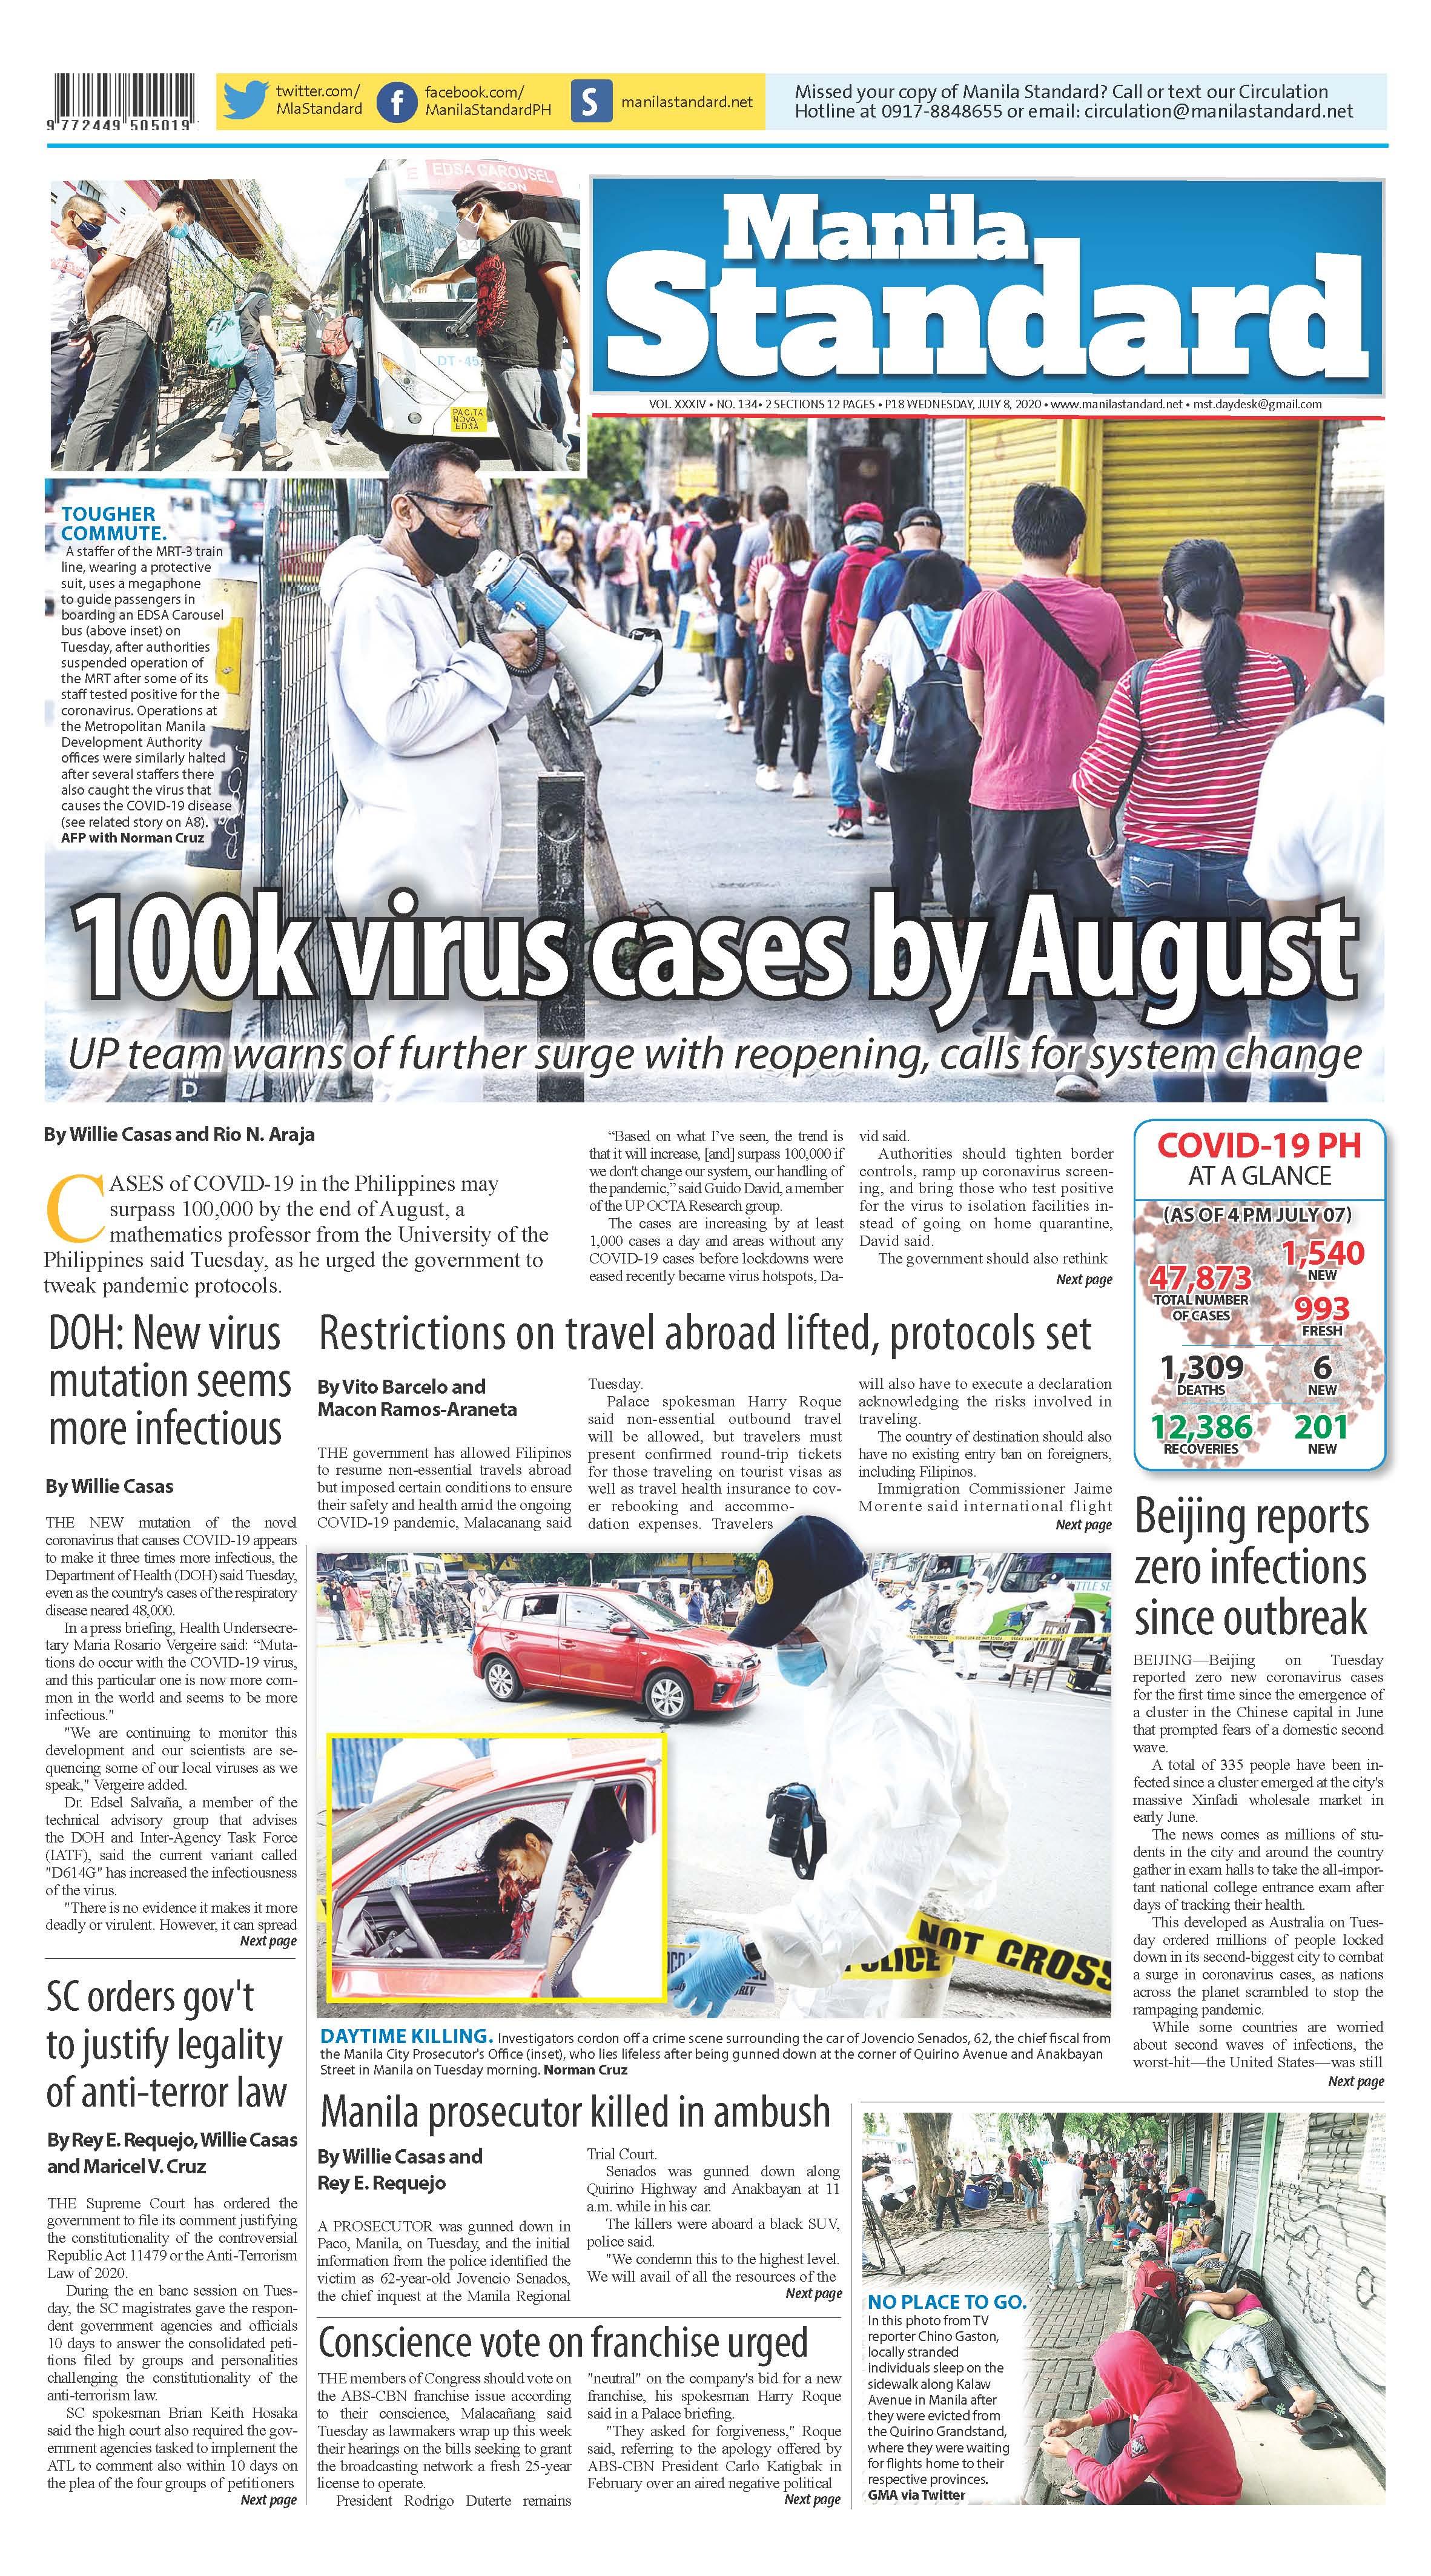 Wednesday Print Edition (07/08/2020)